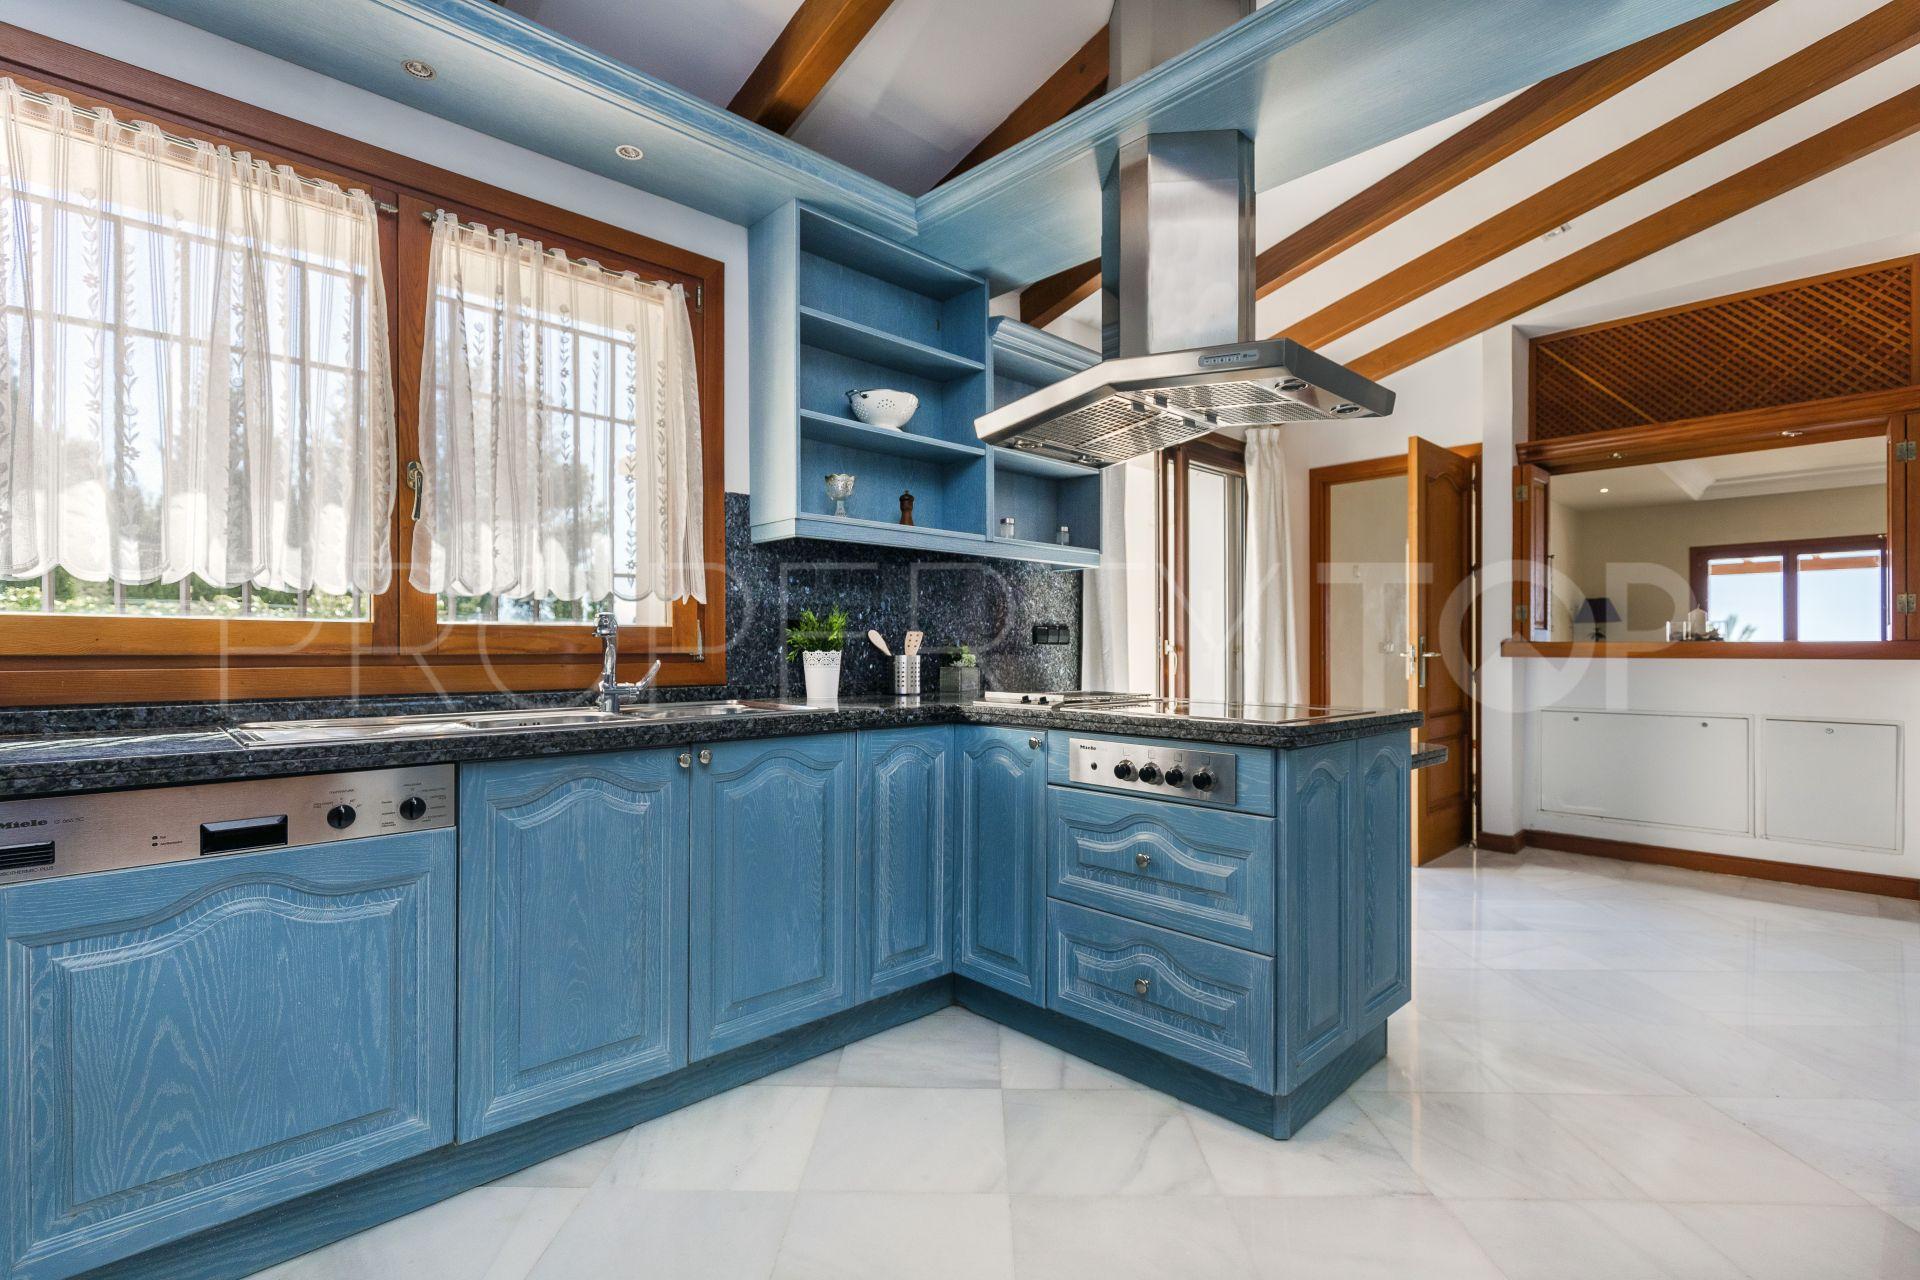 Buy Sierra Blanca villa with 5 bedrooms | Callum Swan Realty